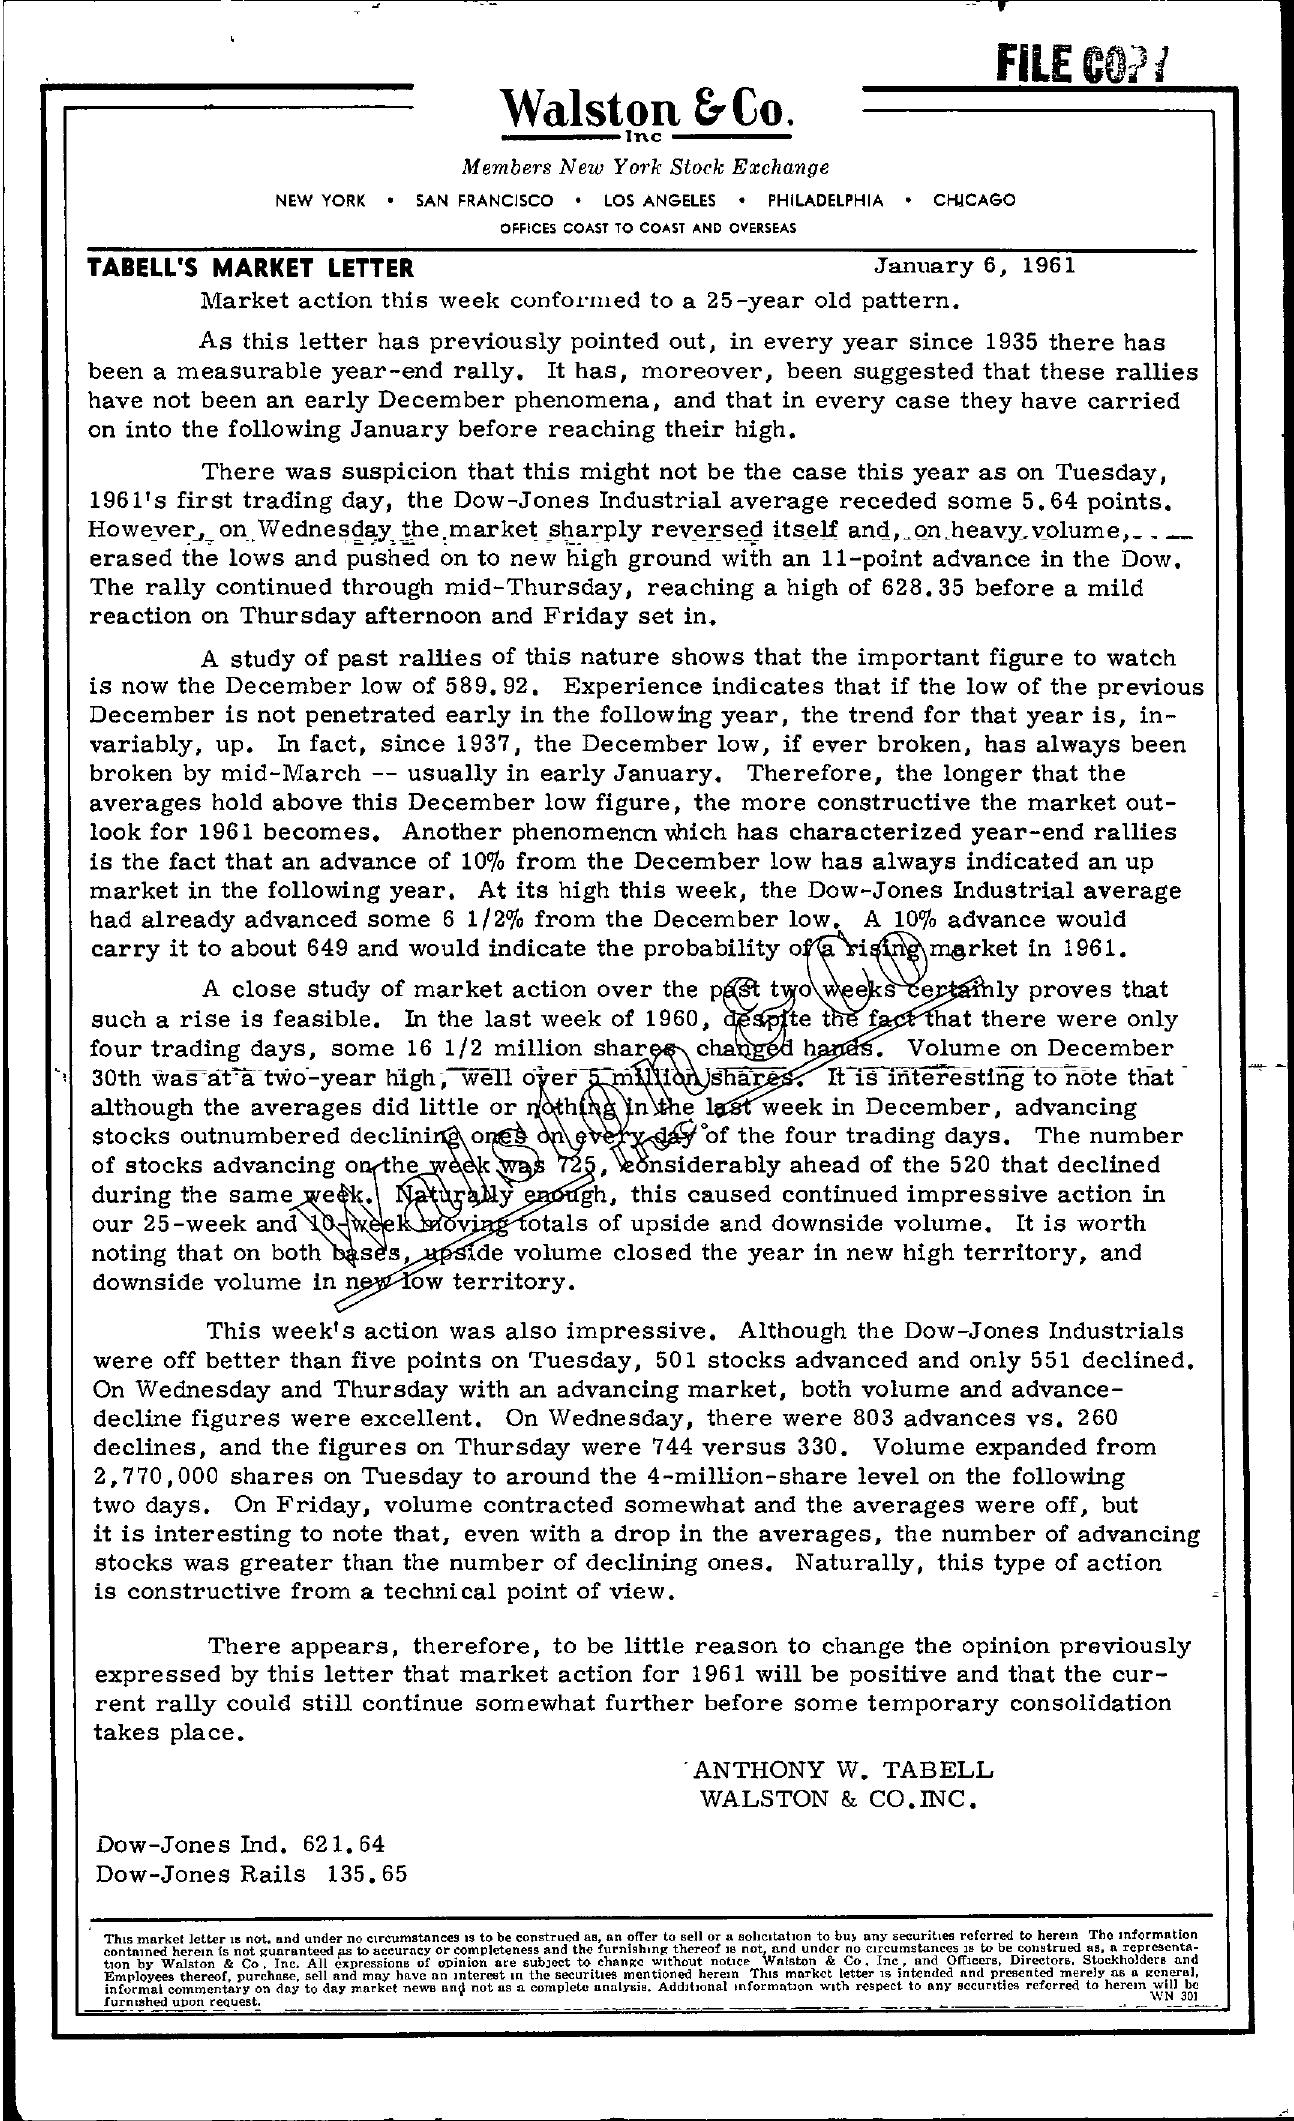 Tabell's Market Letter - January 06, 1961